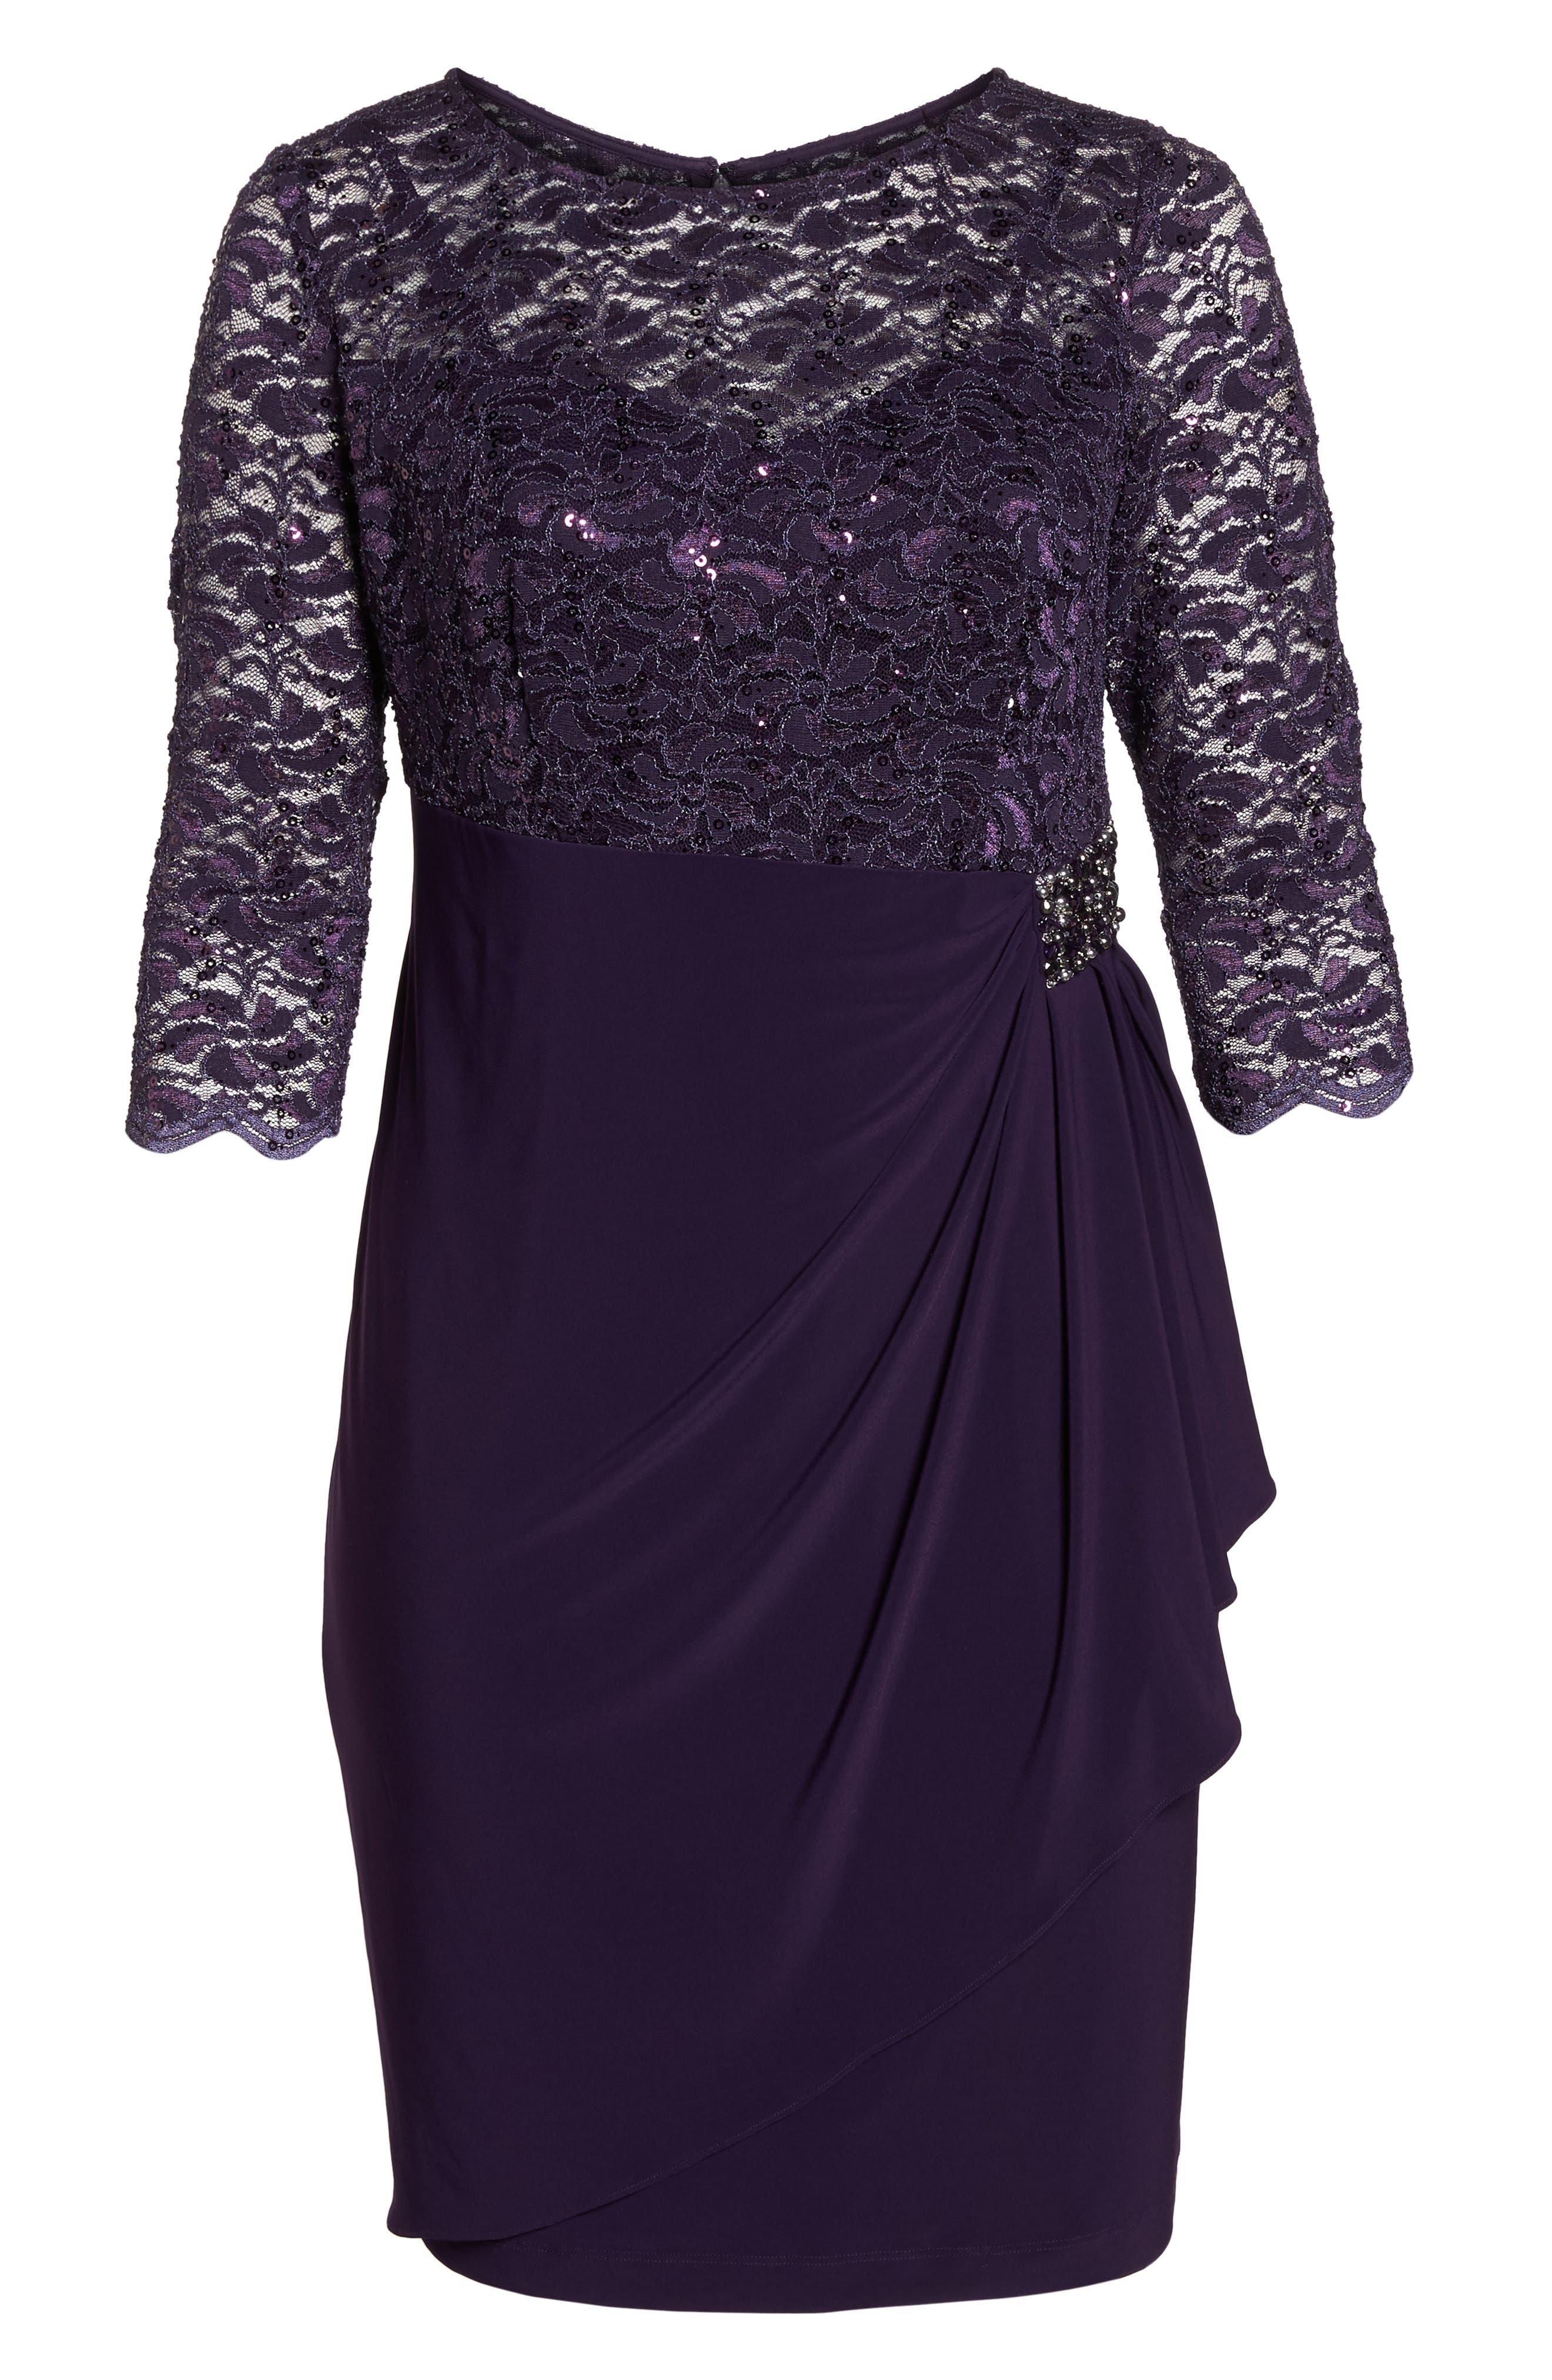 Embellished Ruffle Detail Shift Dress,                             Alternate thumbnail 5, color,                             Eggplant